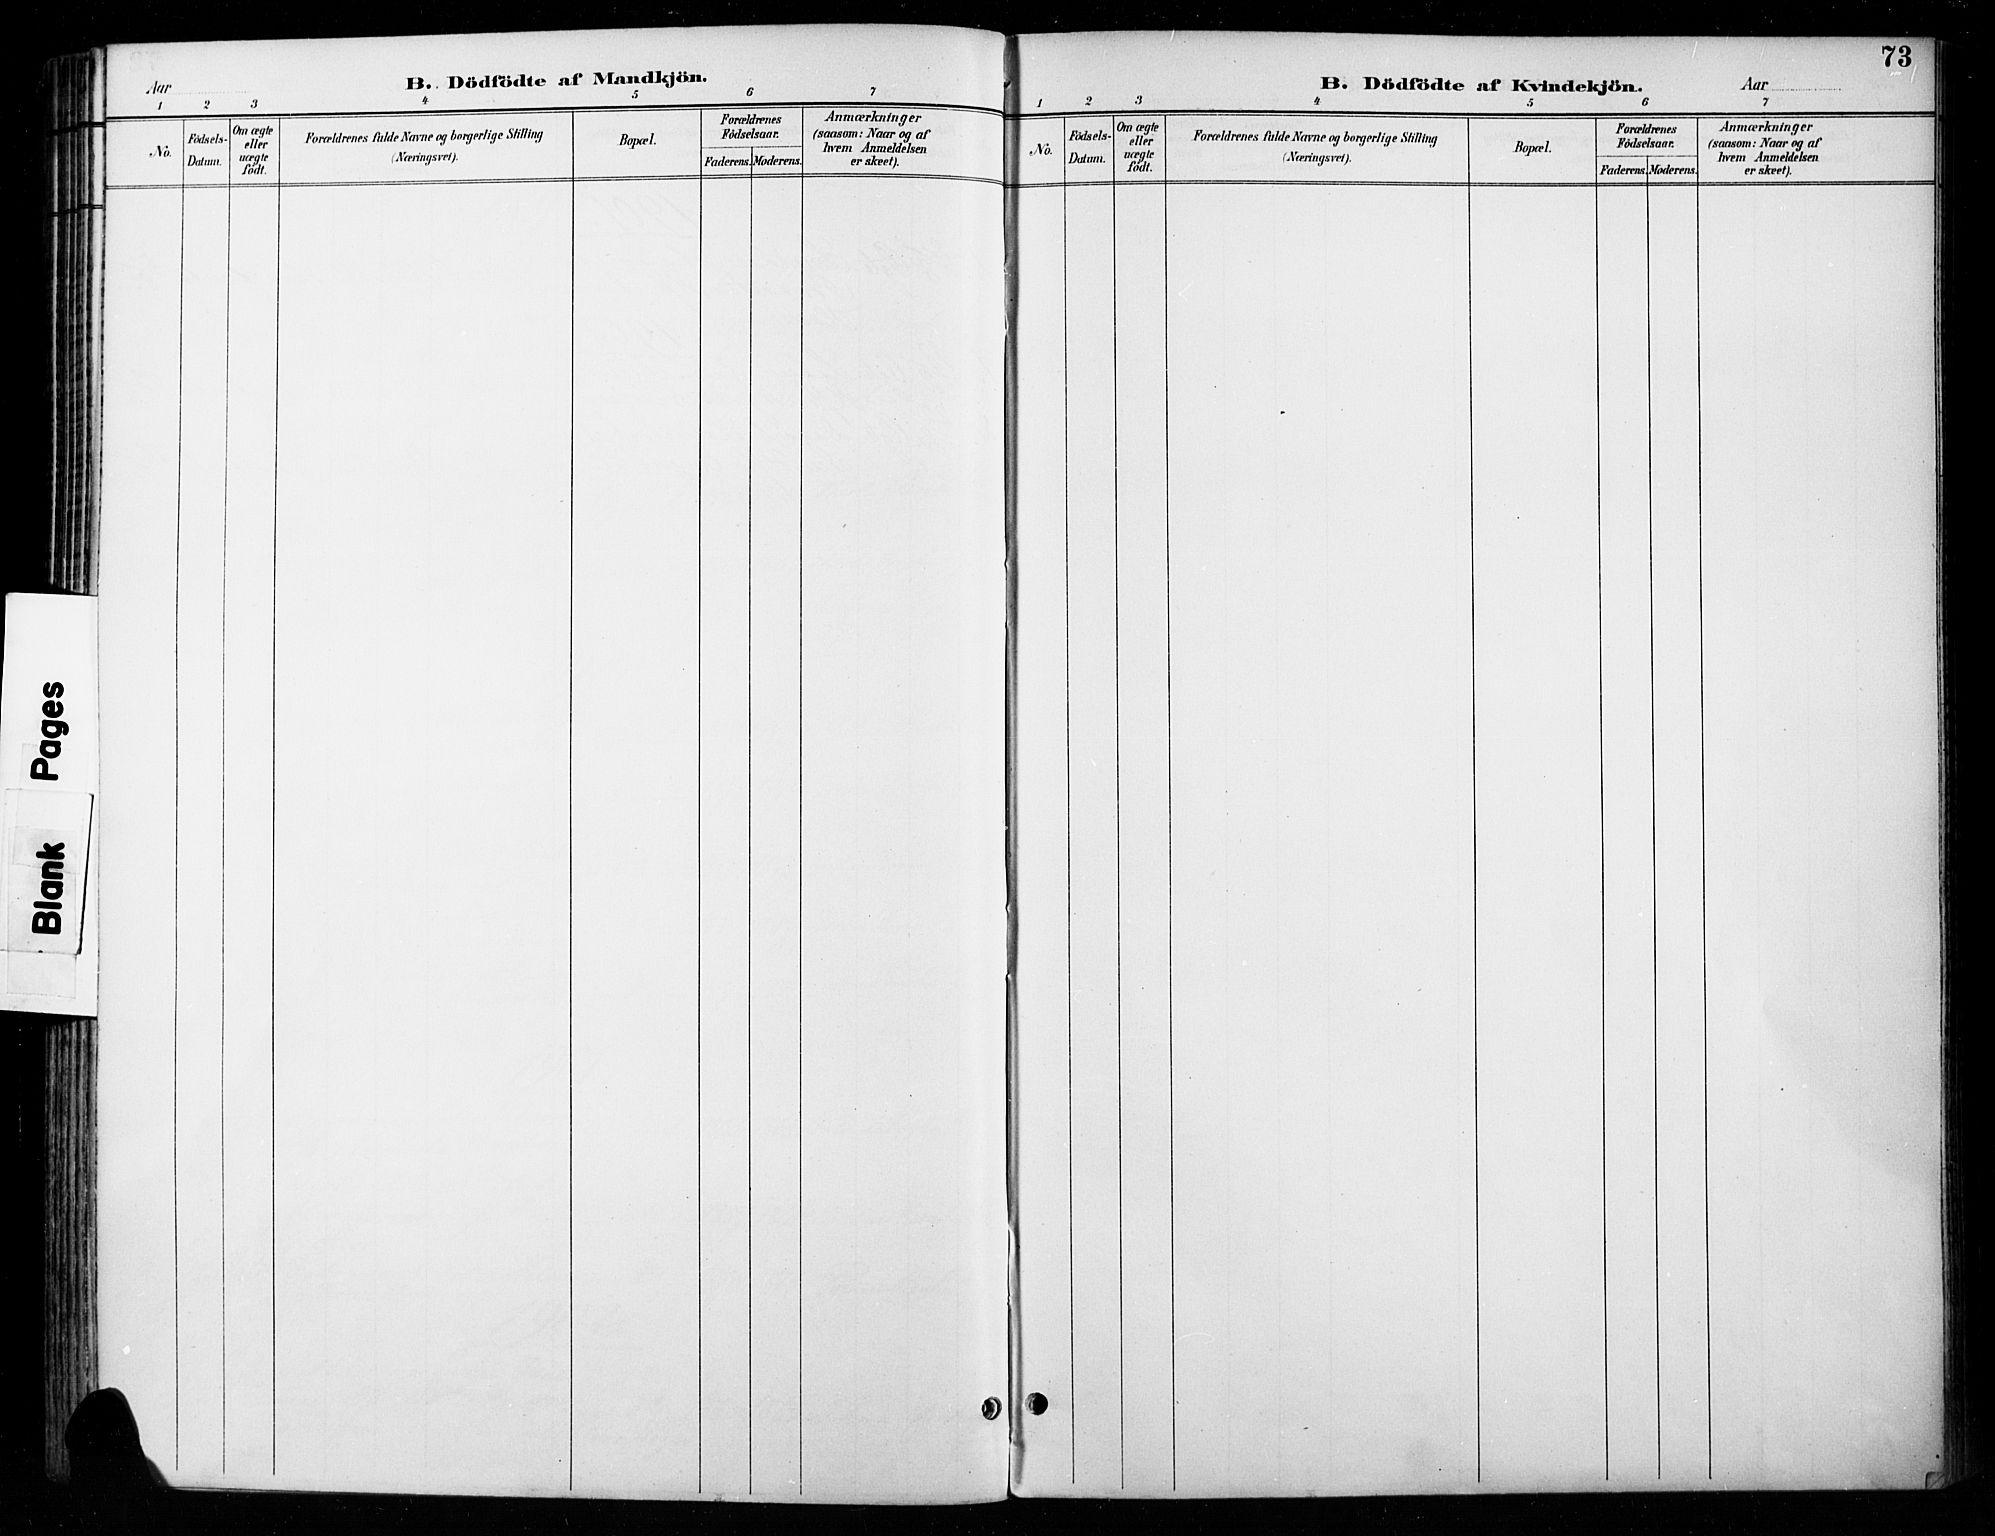 SAH, Vardal prestekontor, H/Ha/Haa/L0011: Ministerialbok nr. 11, 1891-1901, s. 73